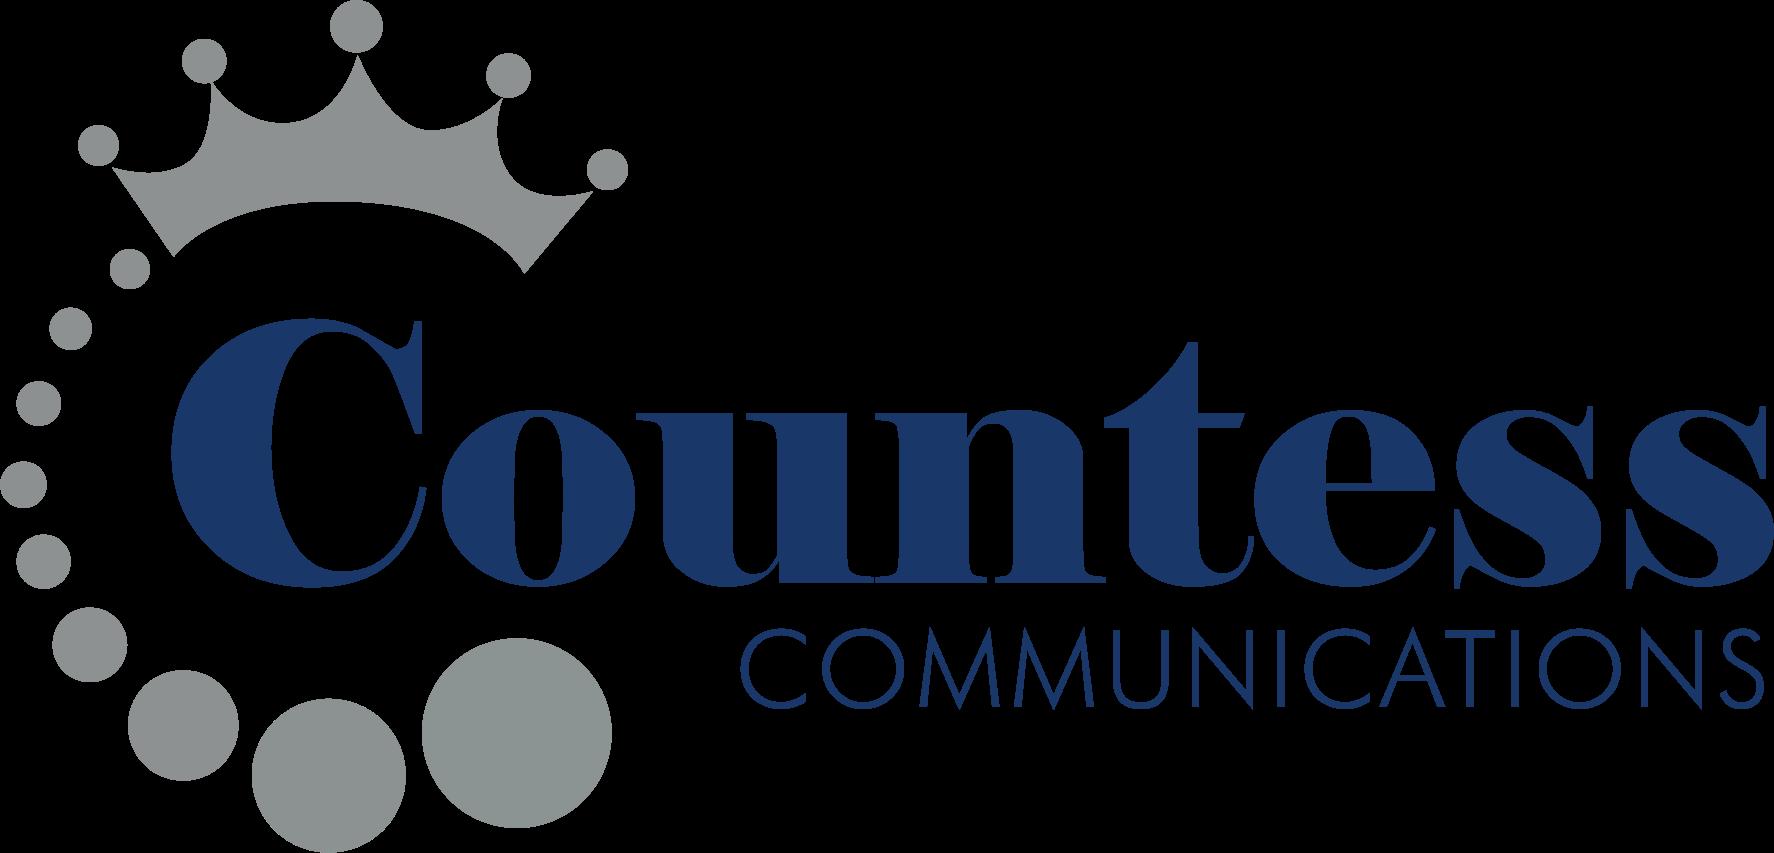 Countess Communications